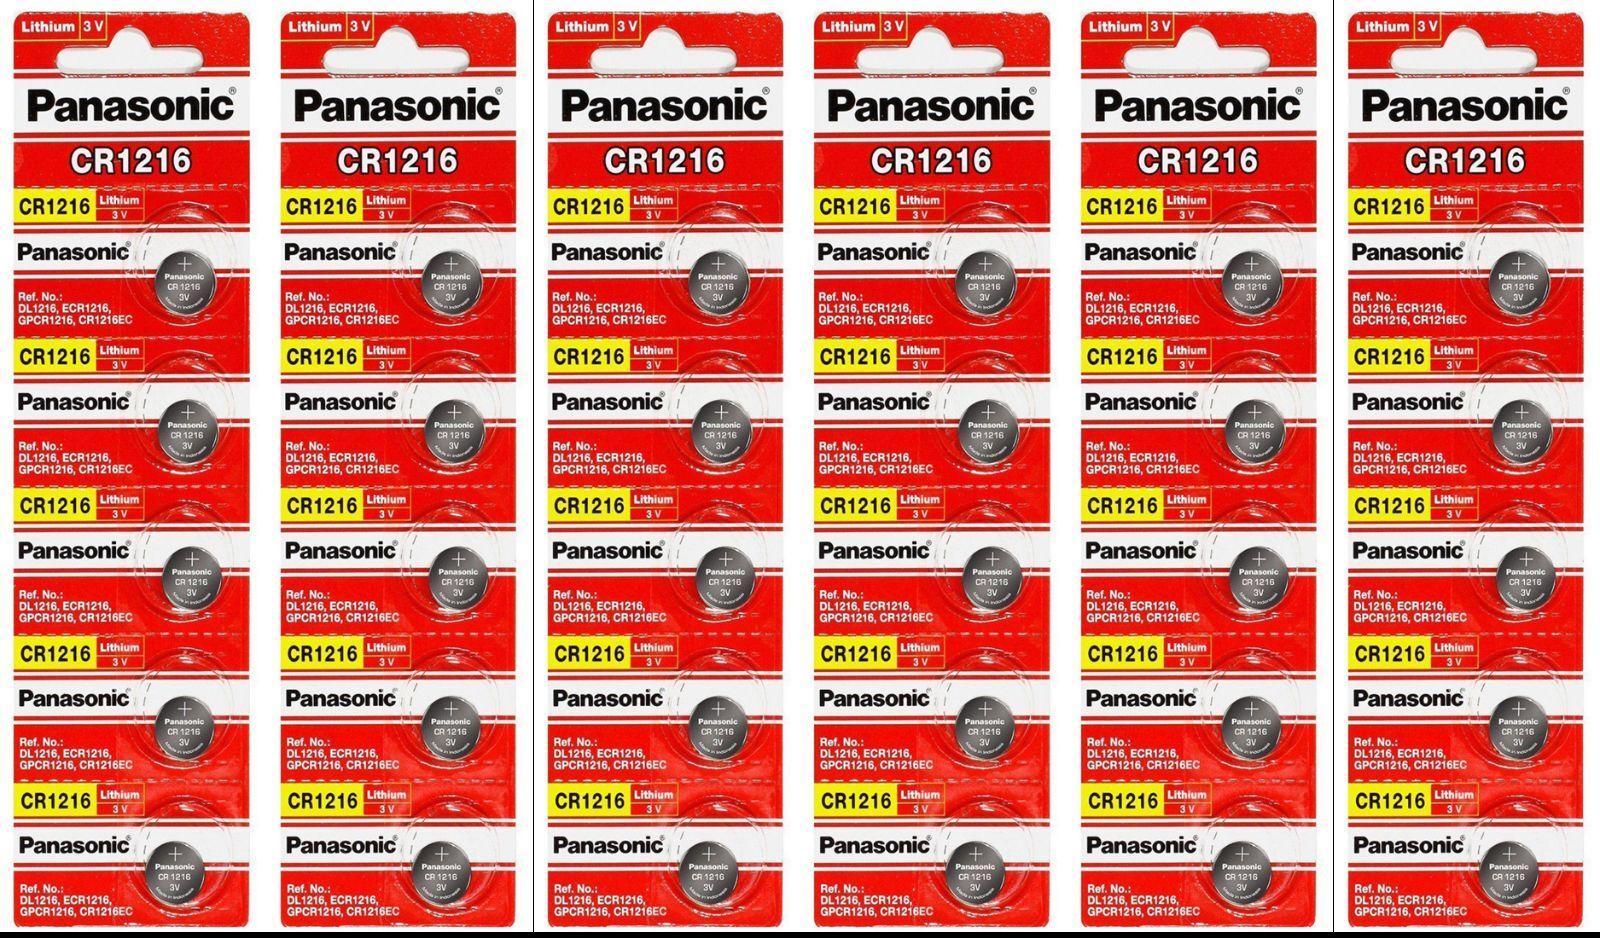 Pack Of 30 Cr1216 Ecr1216 Panasonic Lithium 3v Watch/elec...